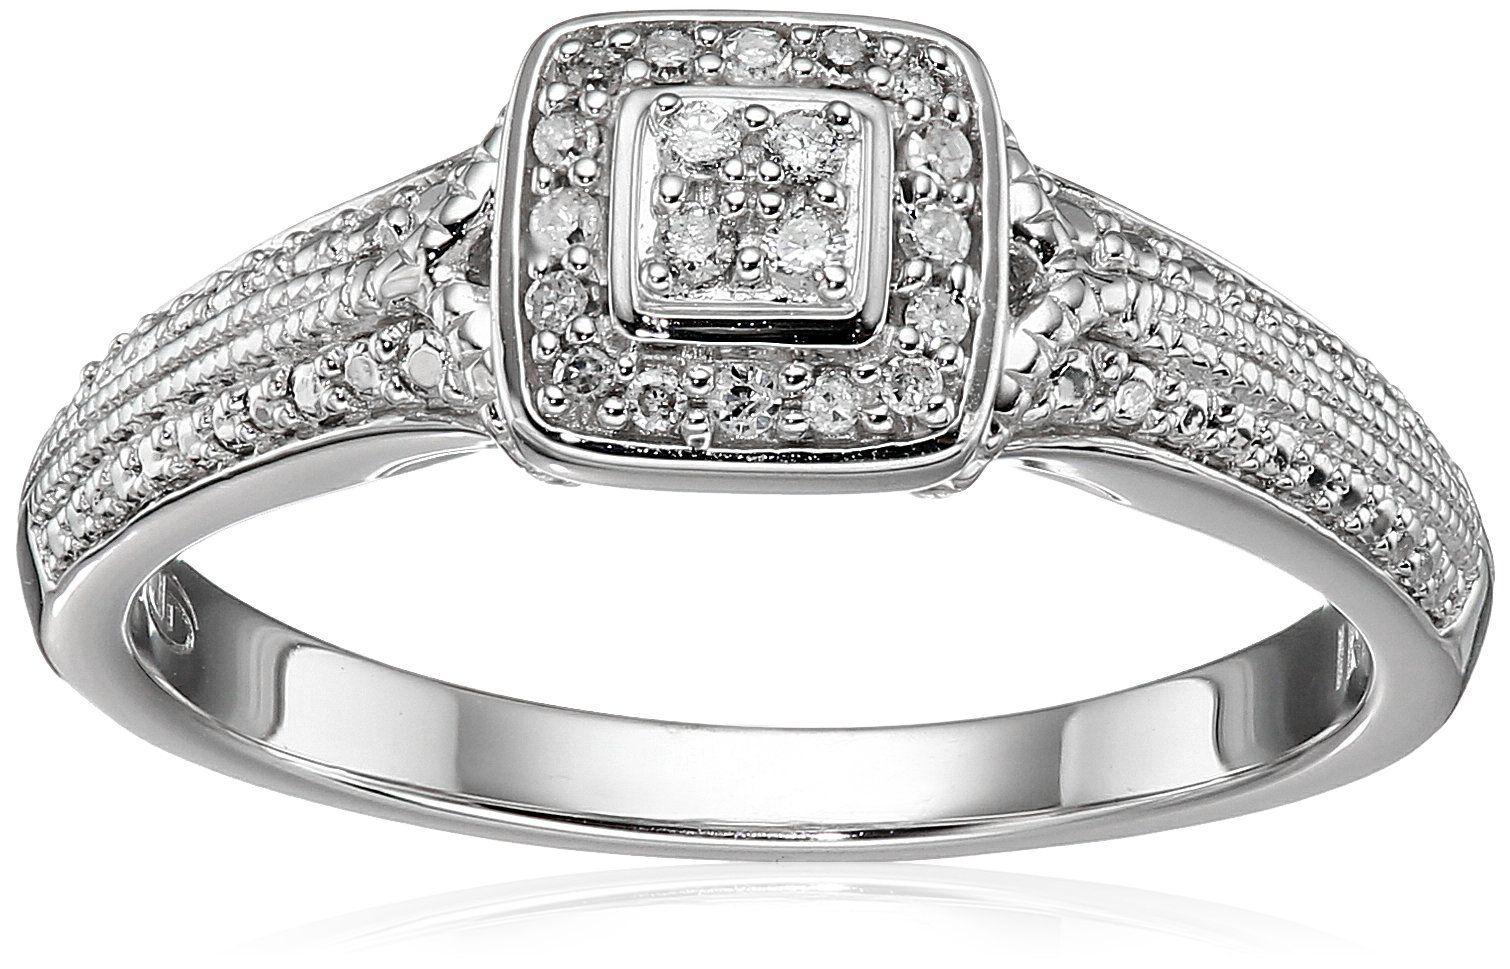 Diamond Friendship Cushion Promise Ring, Size 7 Promise